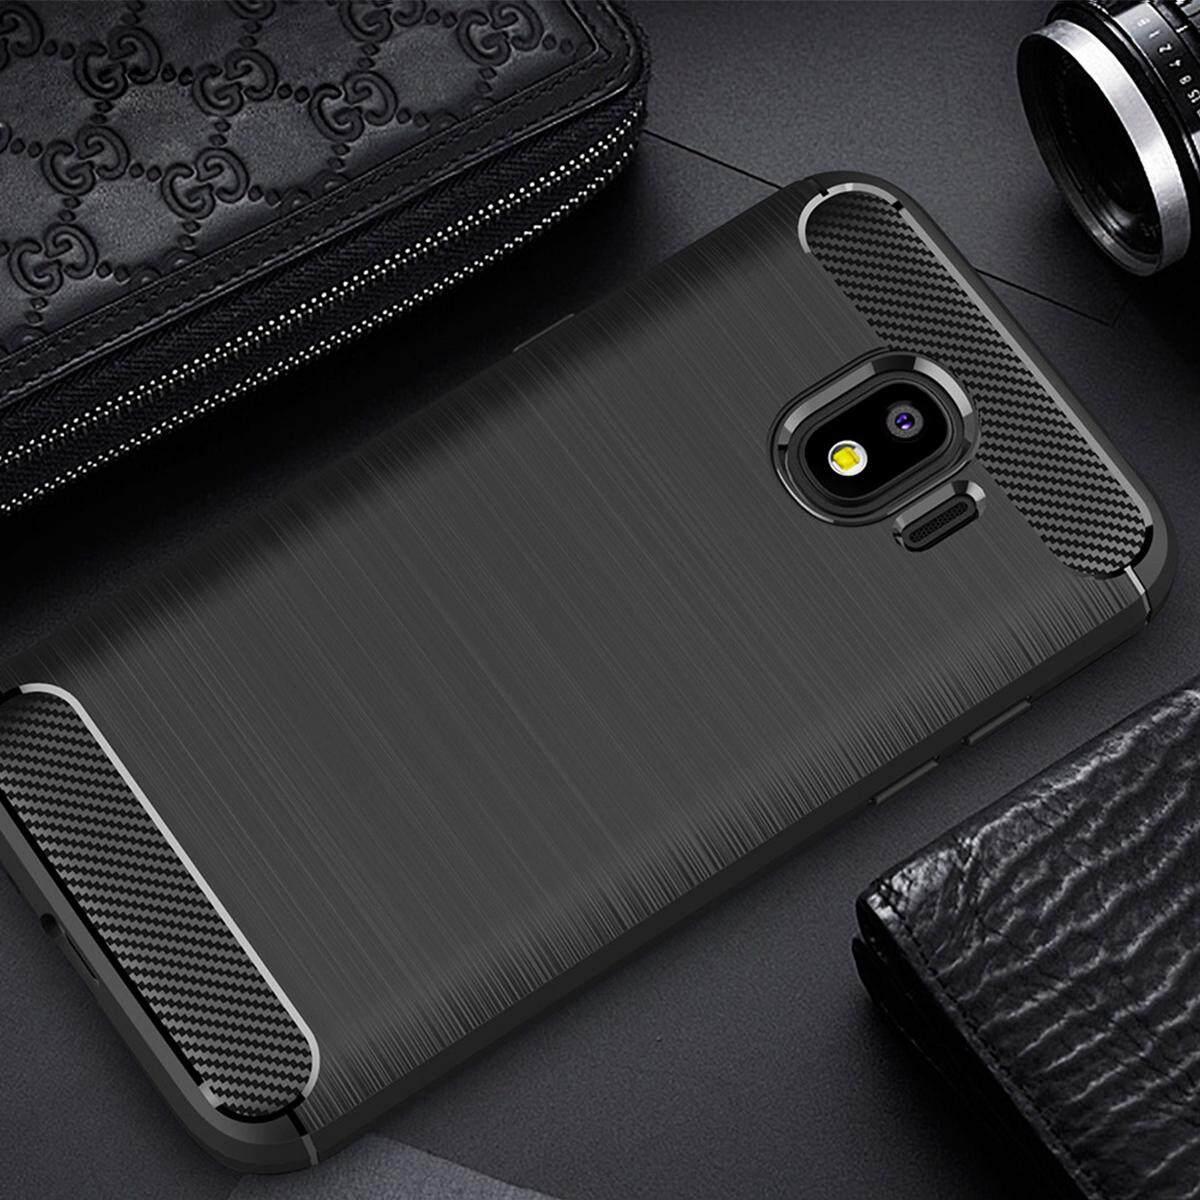 Fitur For Samsung Galaxy J2 Pro 2018 J 2 Pro Sm J250f Ds J 2 Pro